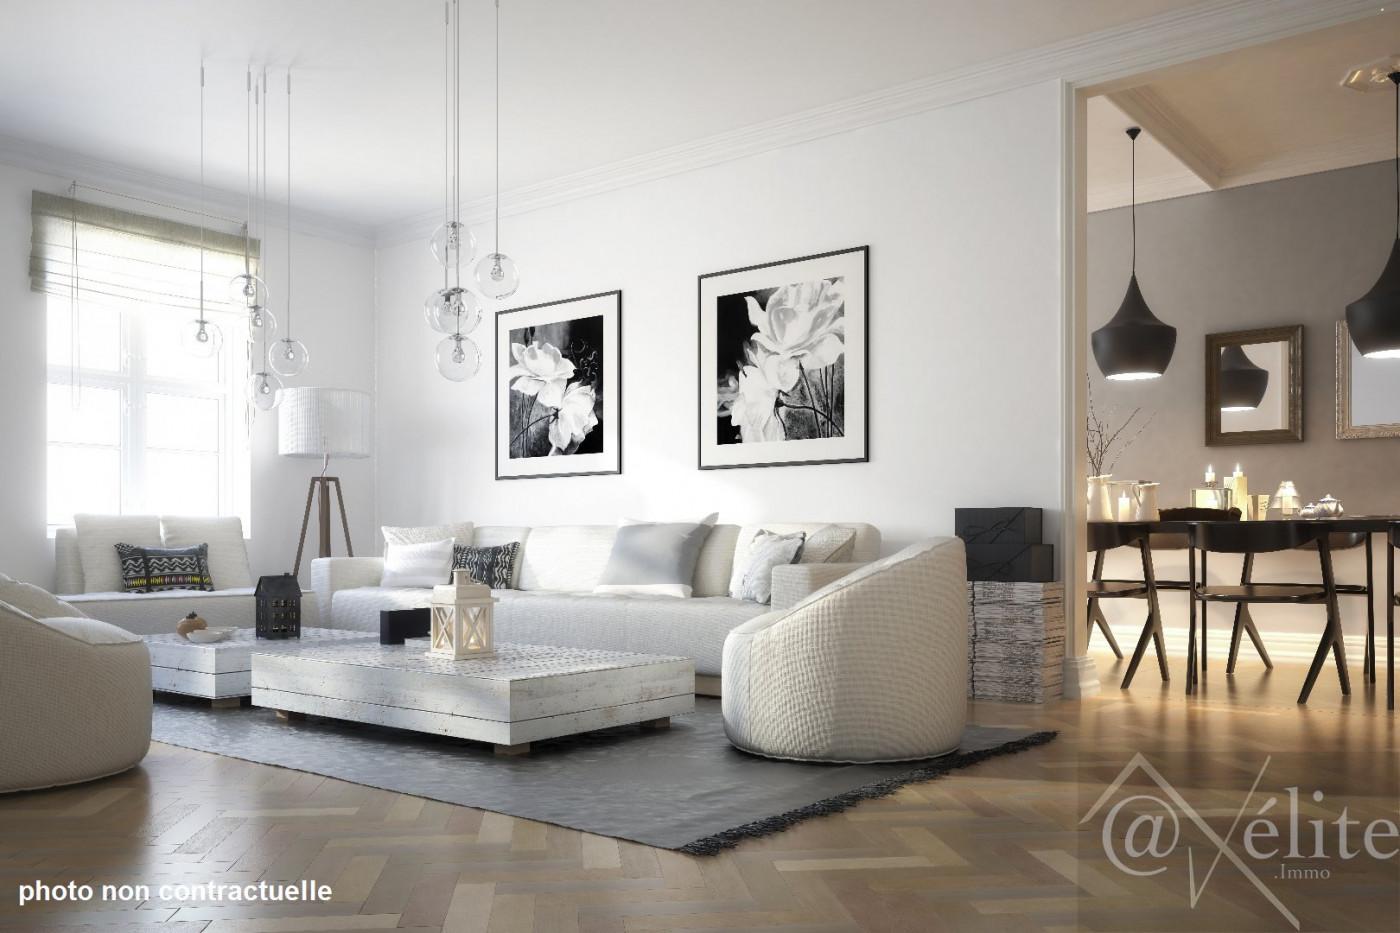 A vendre Chevilly Larue 777922957 Axelite sas